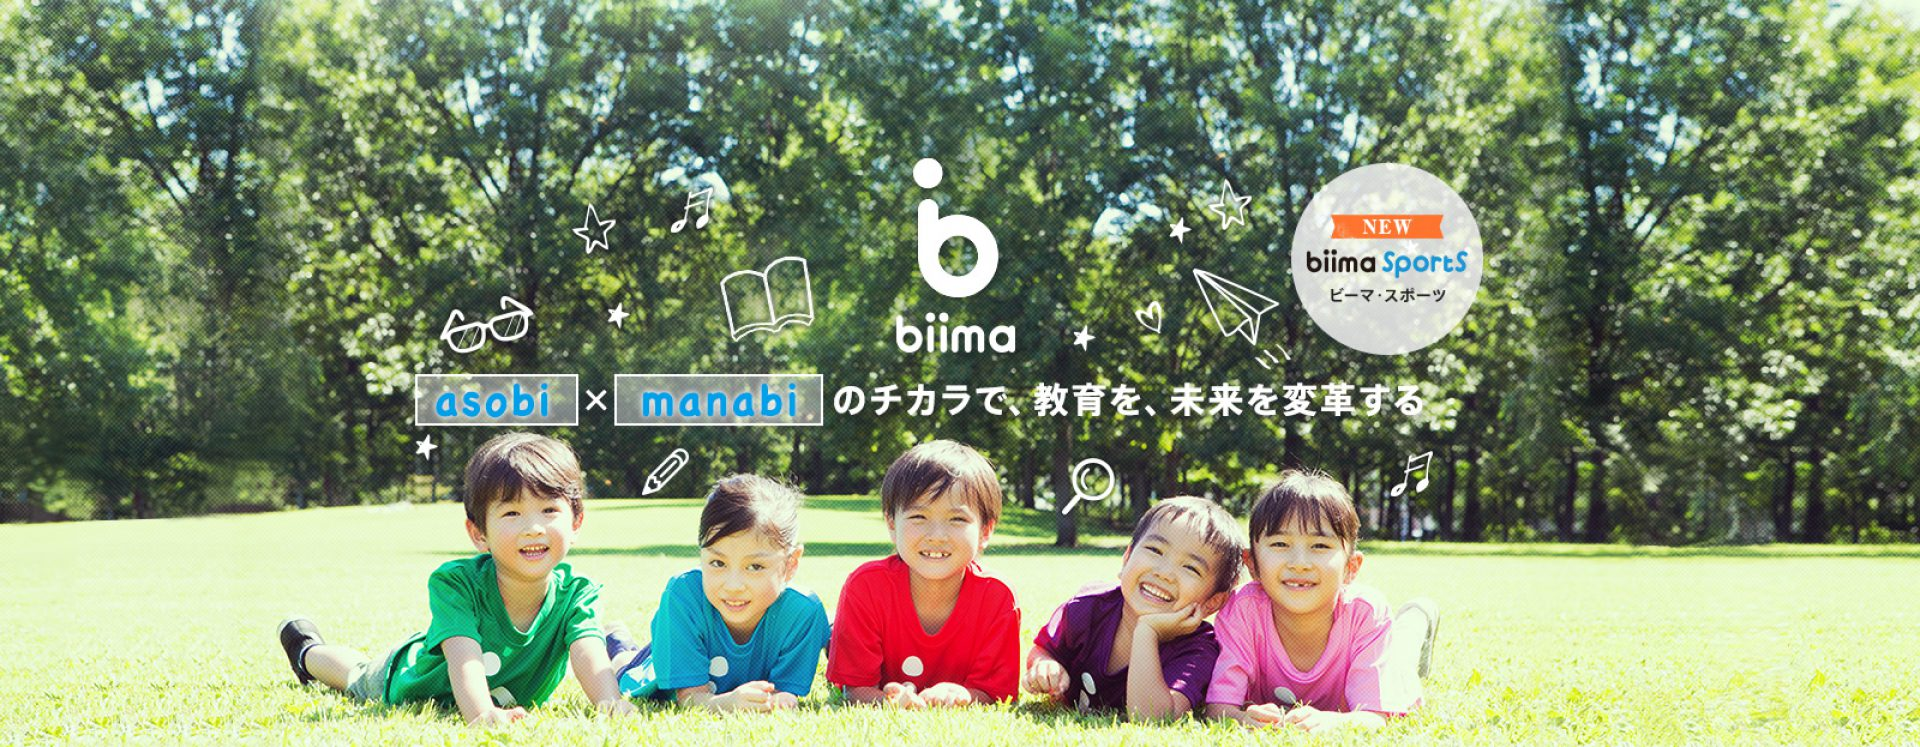 biima, Inc